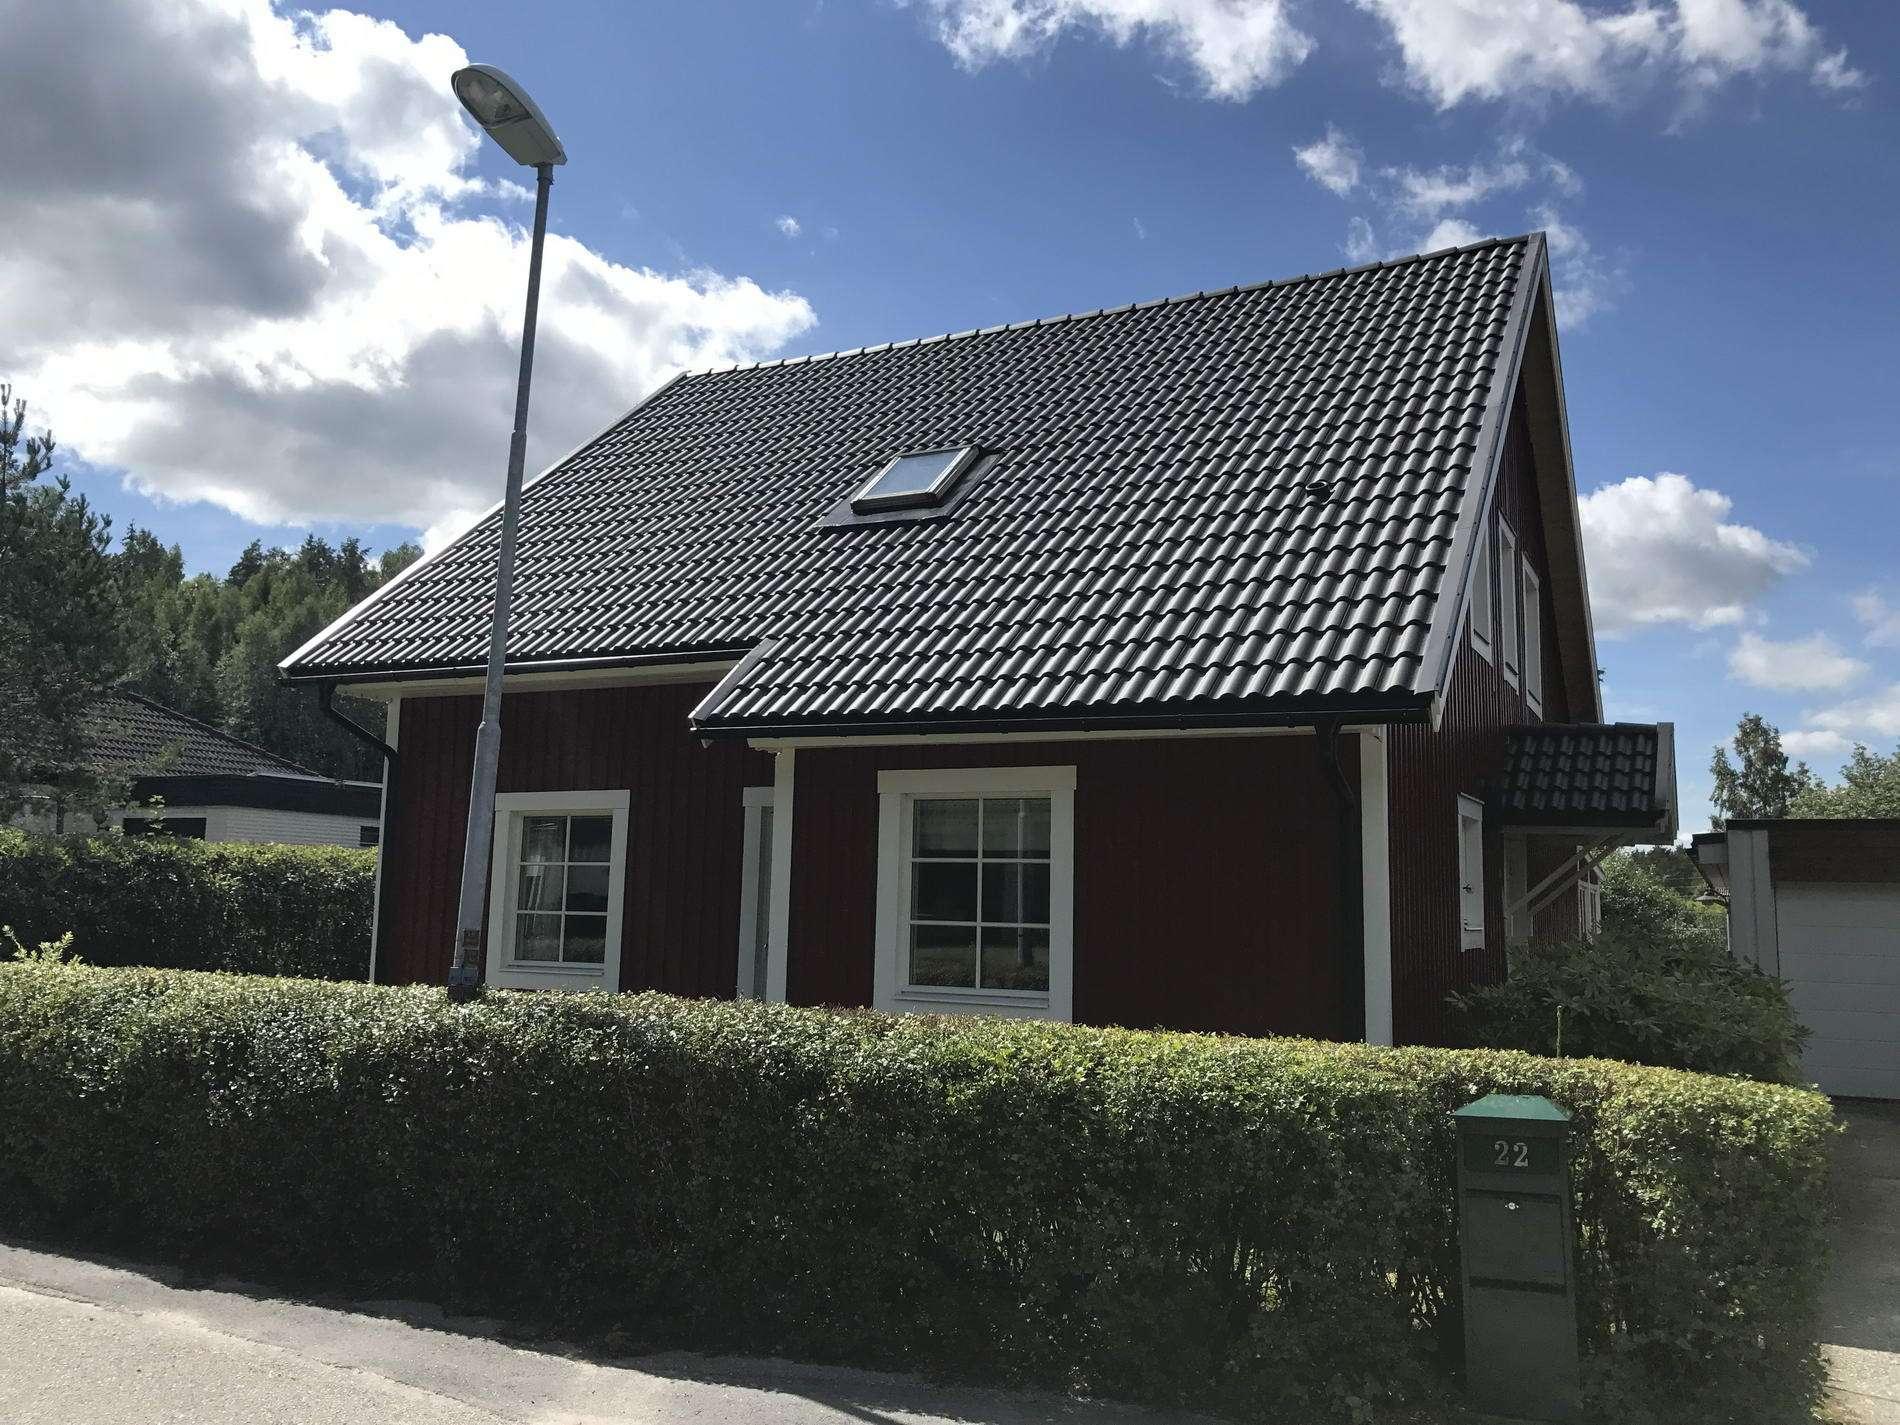 Takrenovering Stockholm – Takarbeten Gnesta